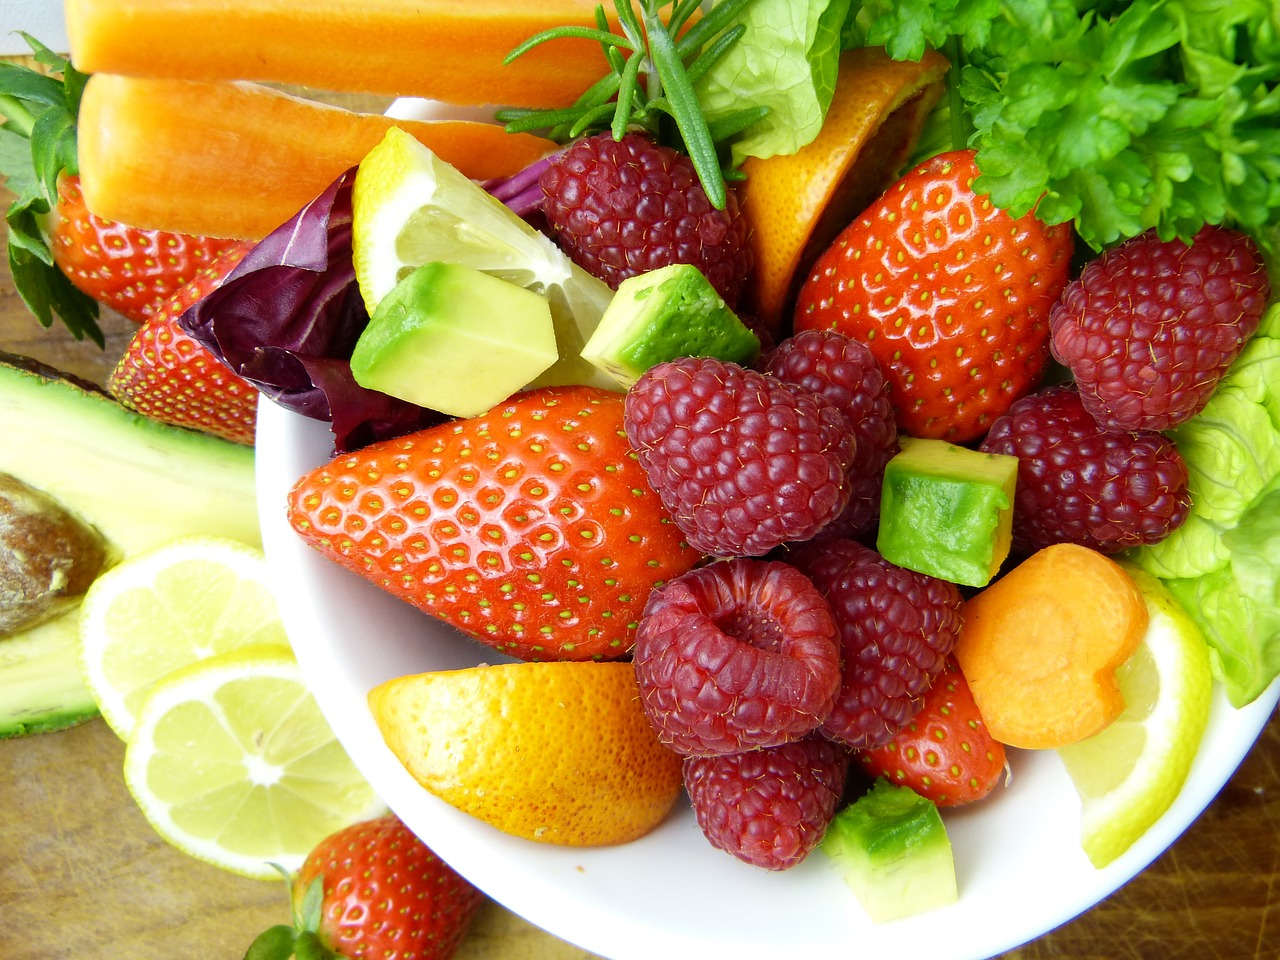 fruit, avocado, lemon